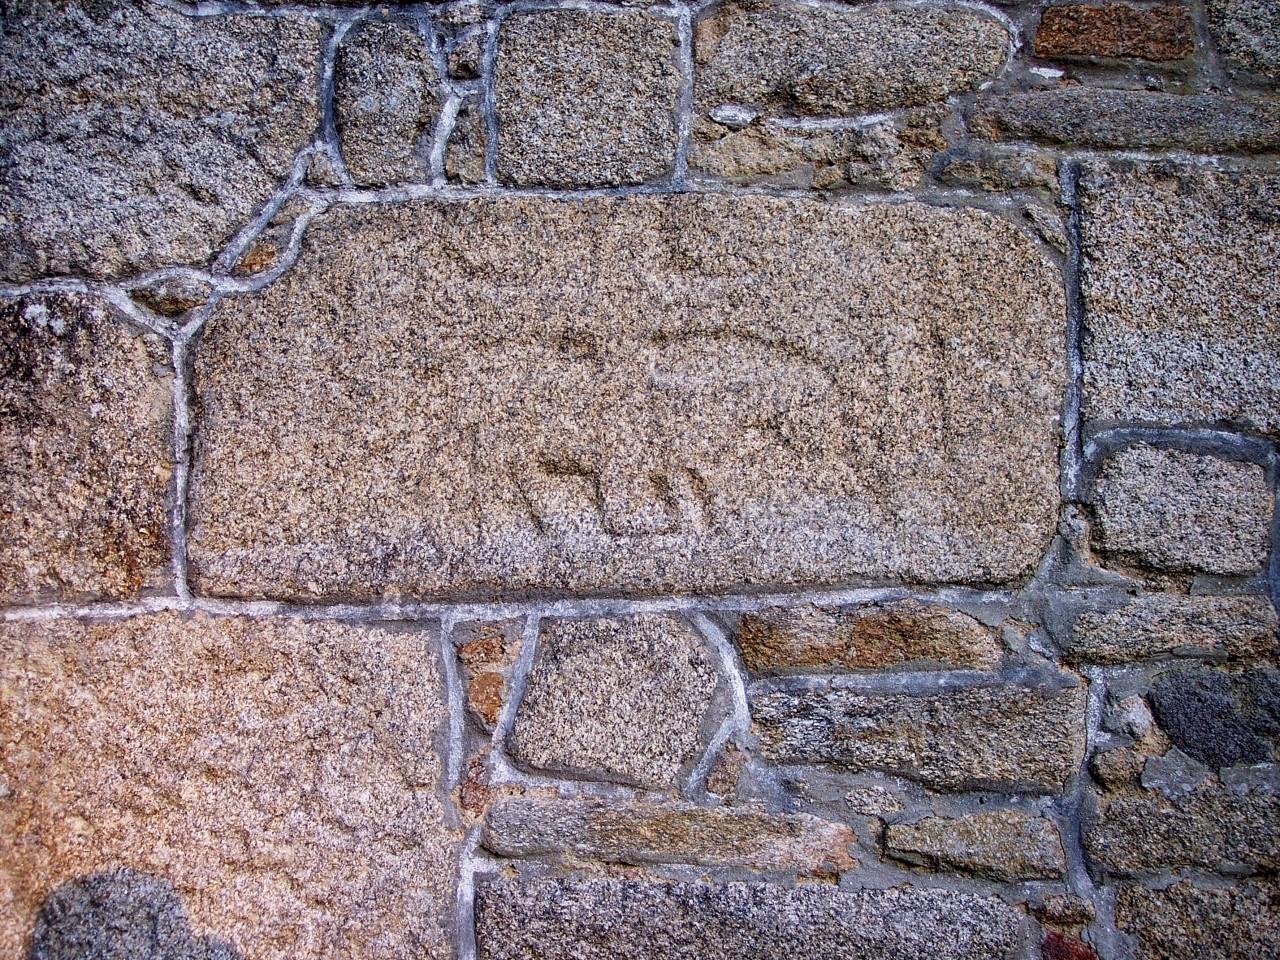 jabali transformado en cordero pascual con cruz yustapuesta b